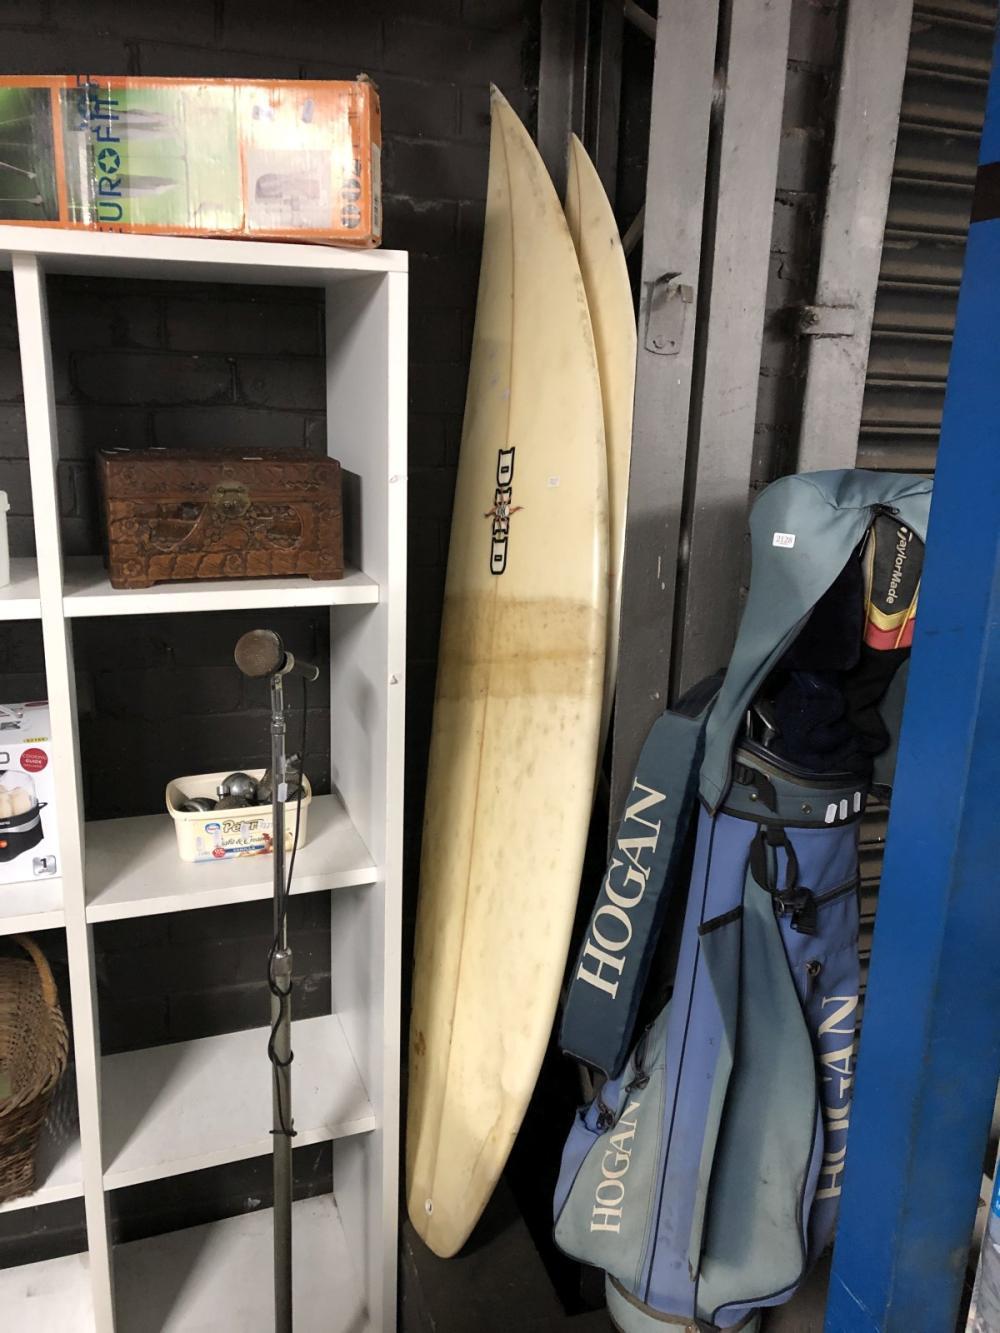 2 Surfboards